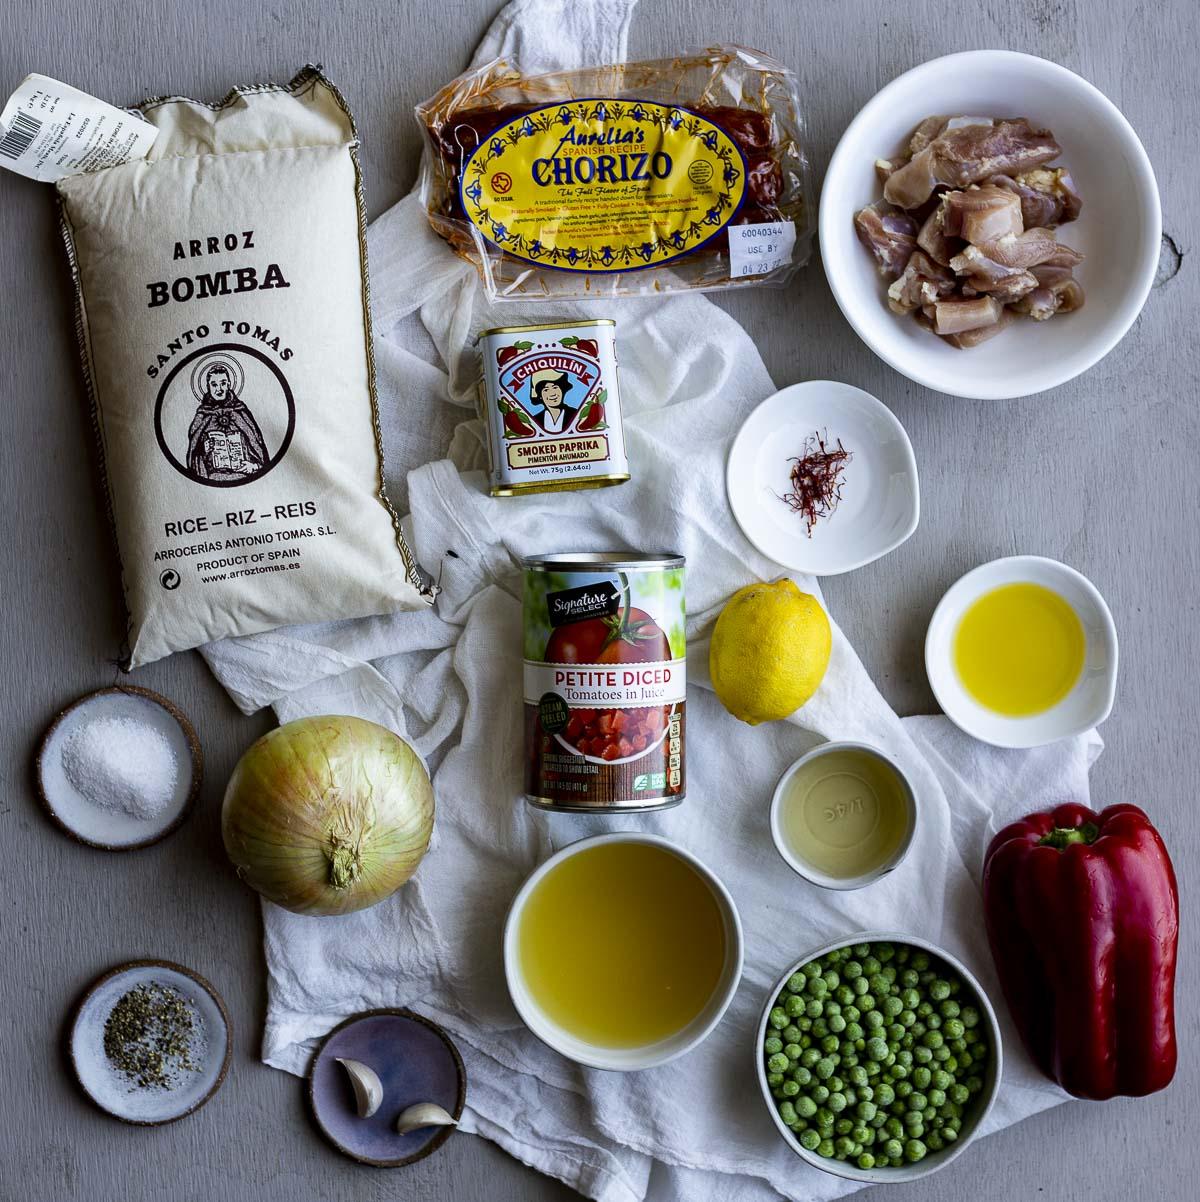 Ingredients to make Spanish chicken and chorizo paella arranged individually.